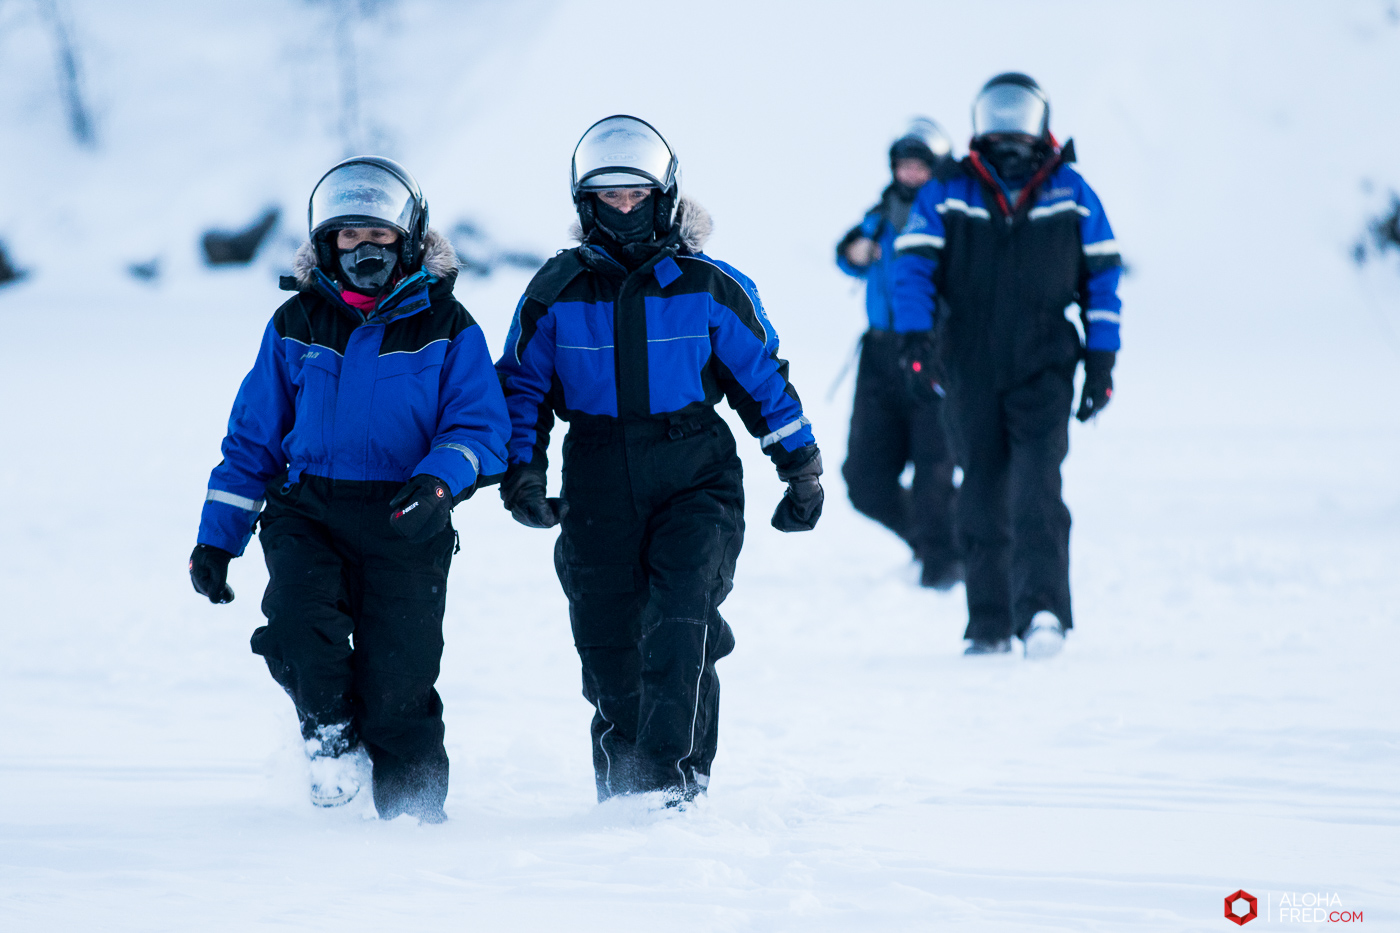 0009 - alohafred Laponie - 6R1A5985